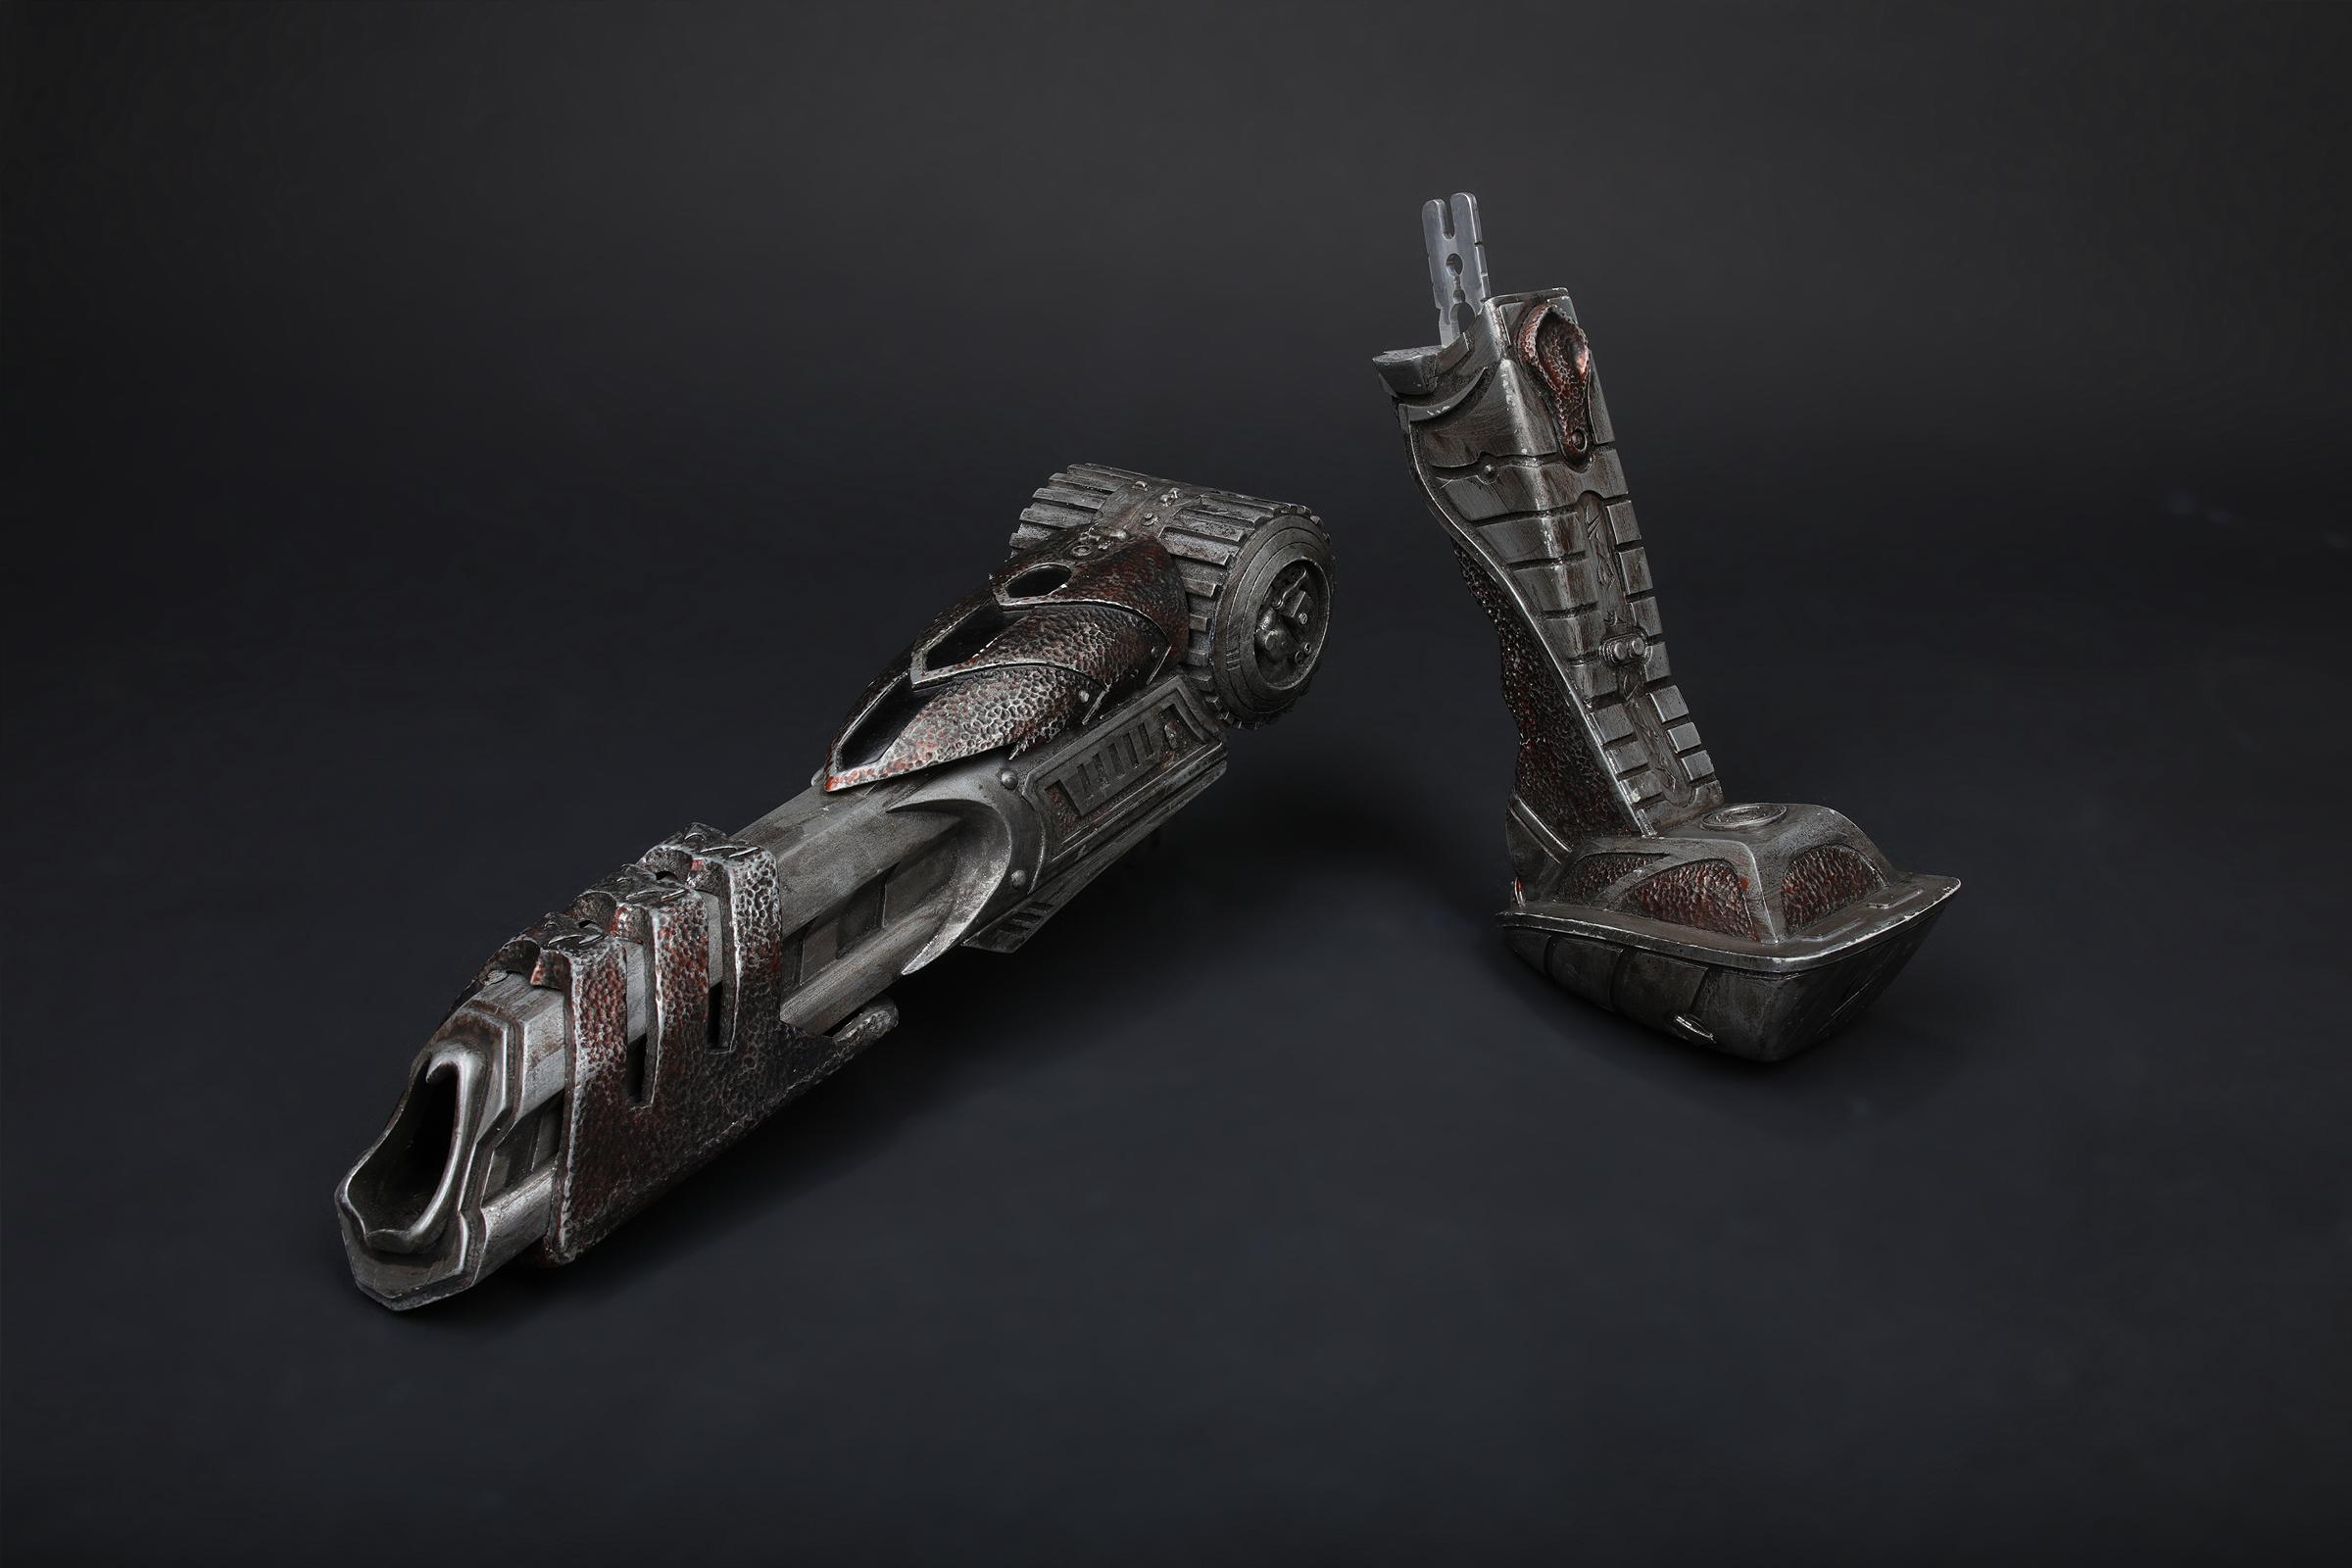 avpr-wolf-predator-plasma-cannon-02.jpg